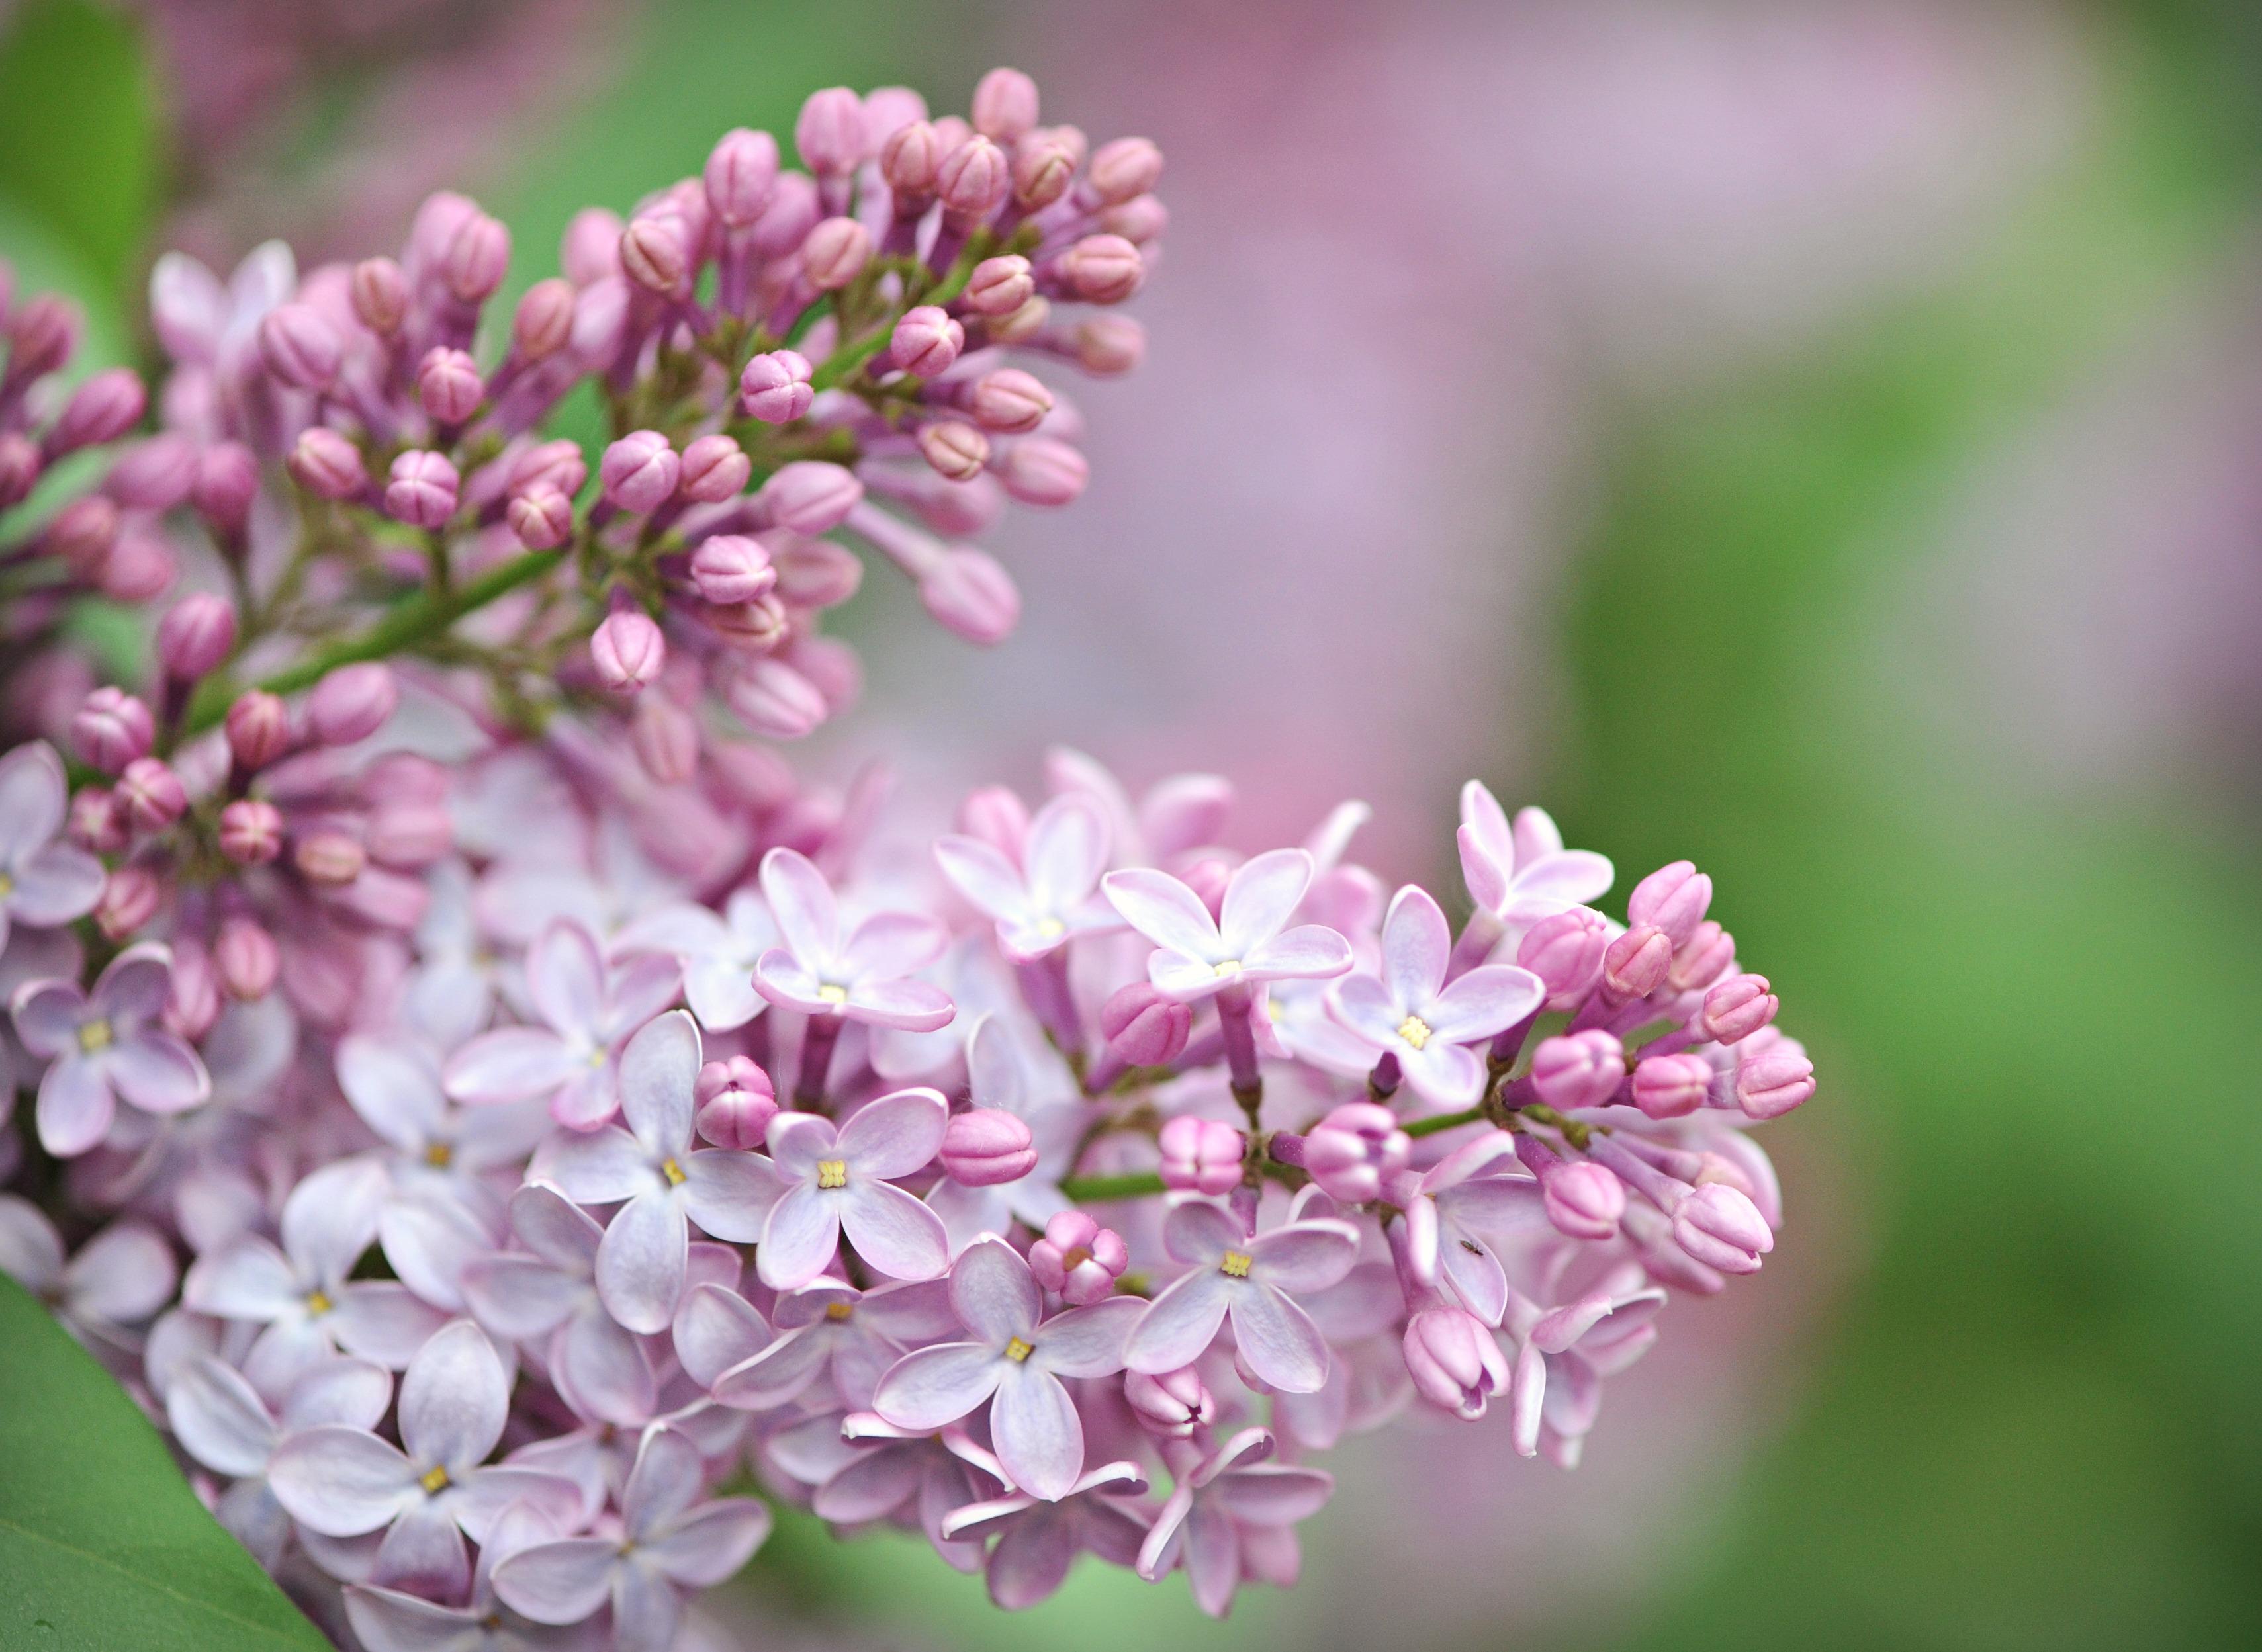 Wallpaper Bunga Bunga Cantik Ungu Harum Lilac Selamat Hari